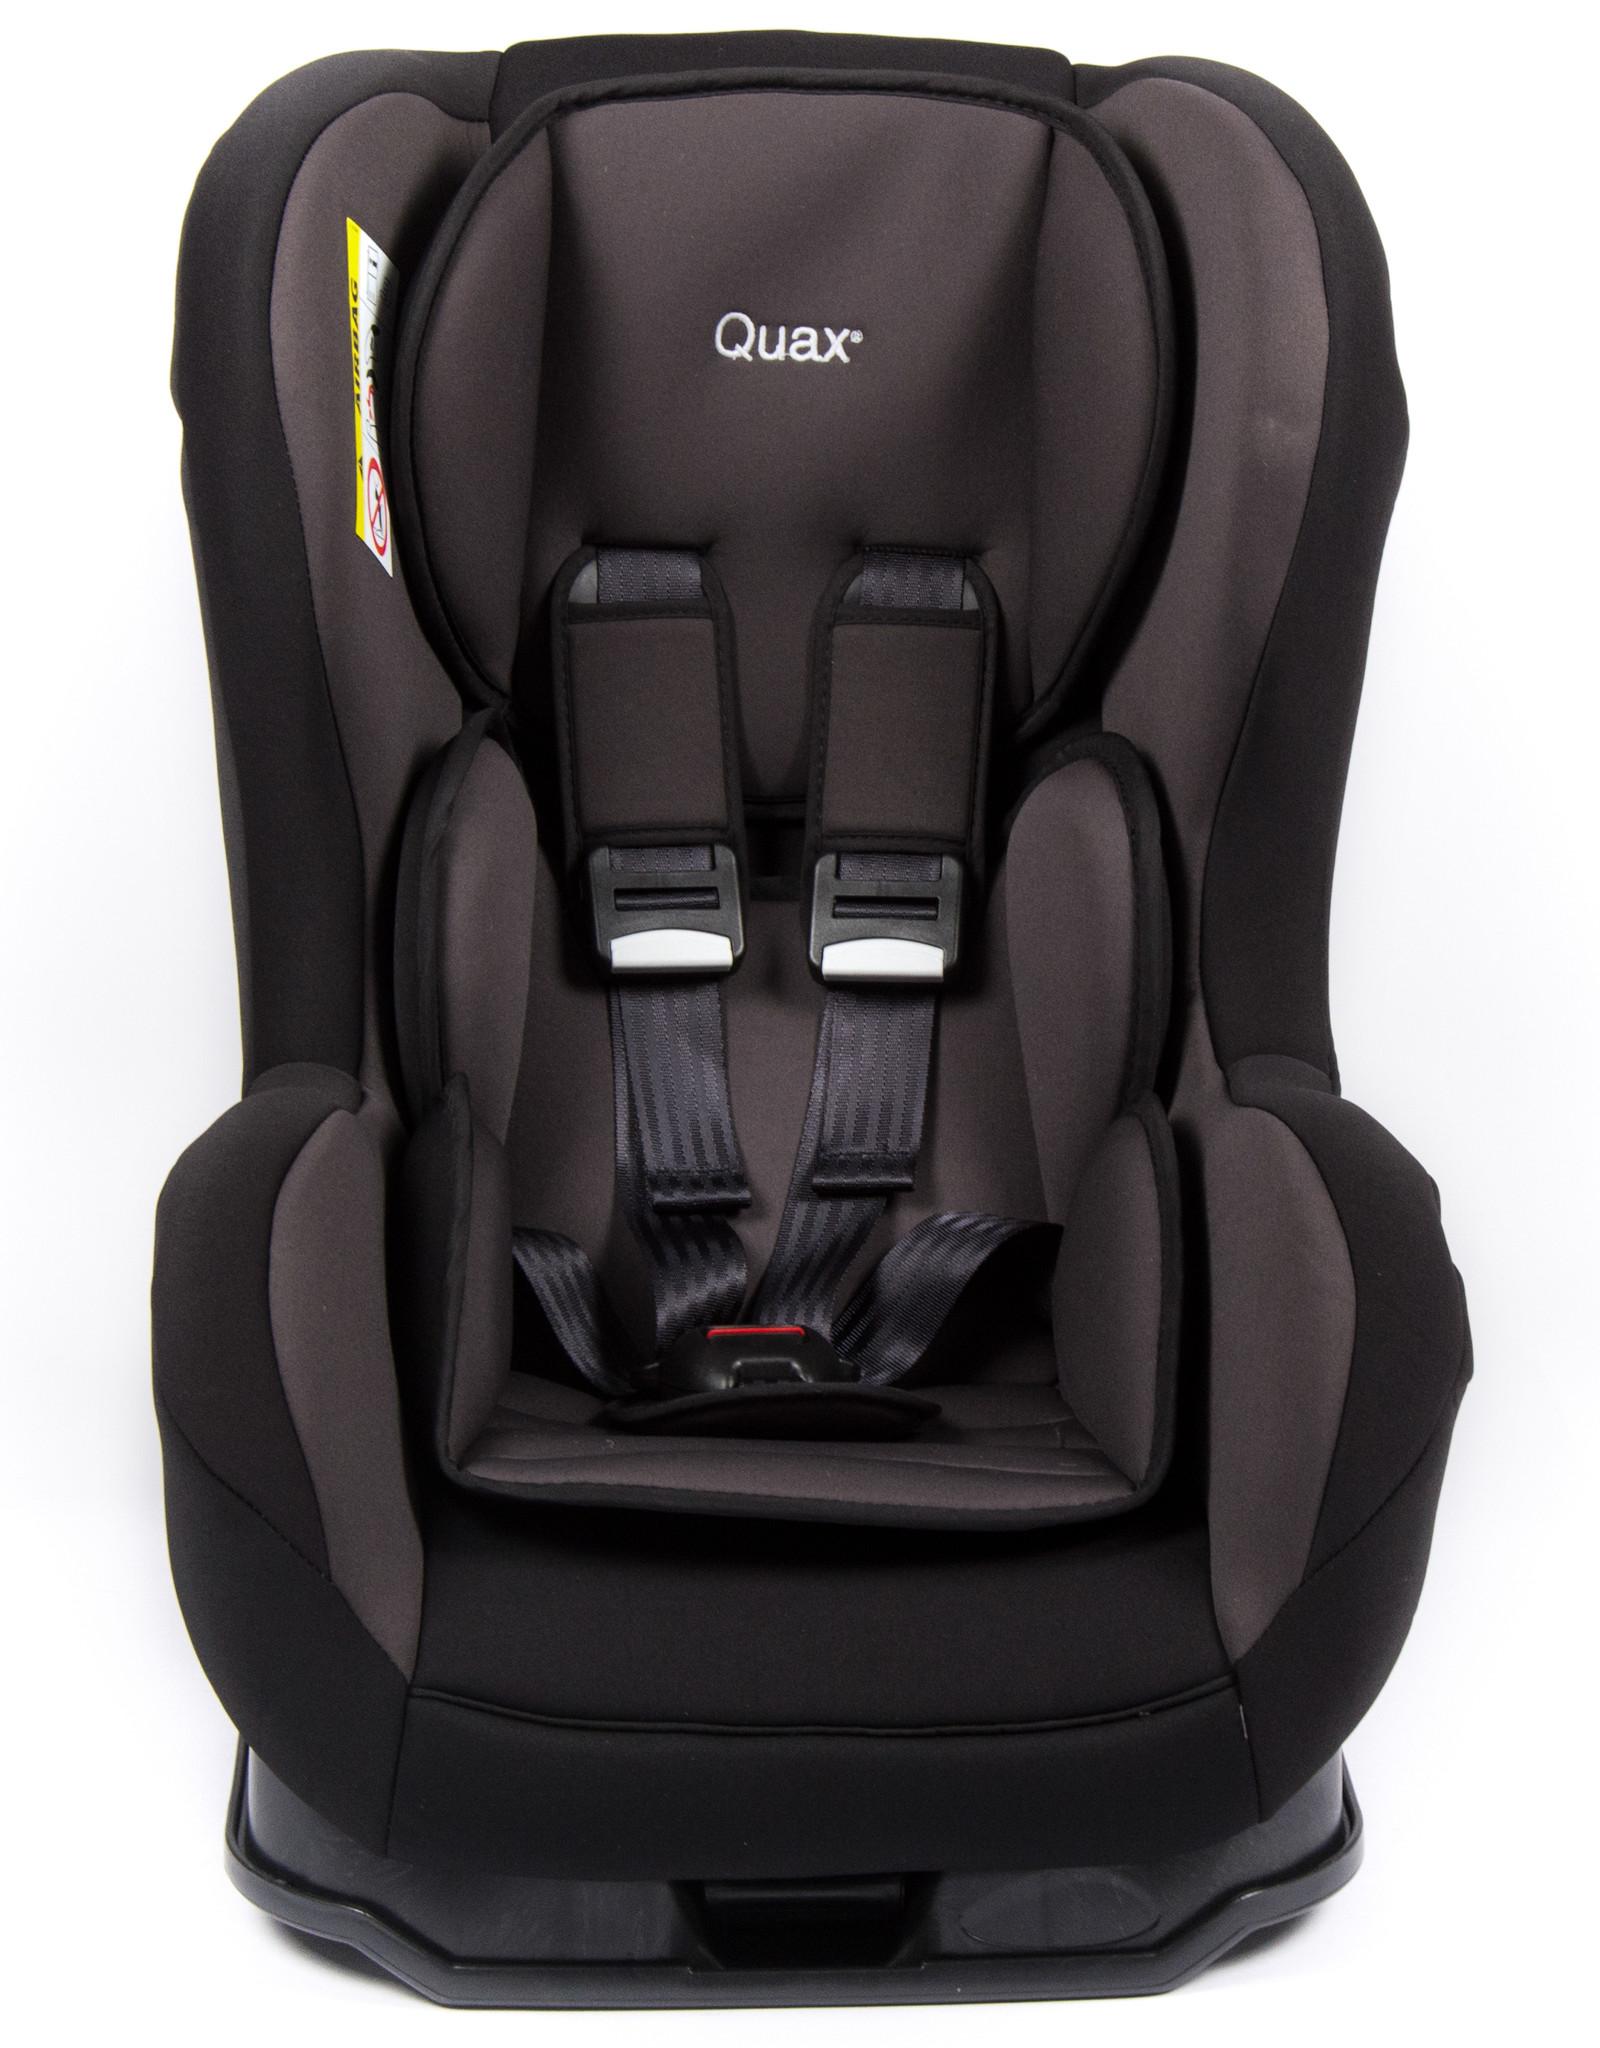 Quax Cosmo - Noir - Groupe 0/1